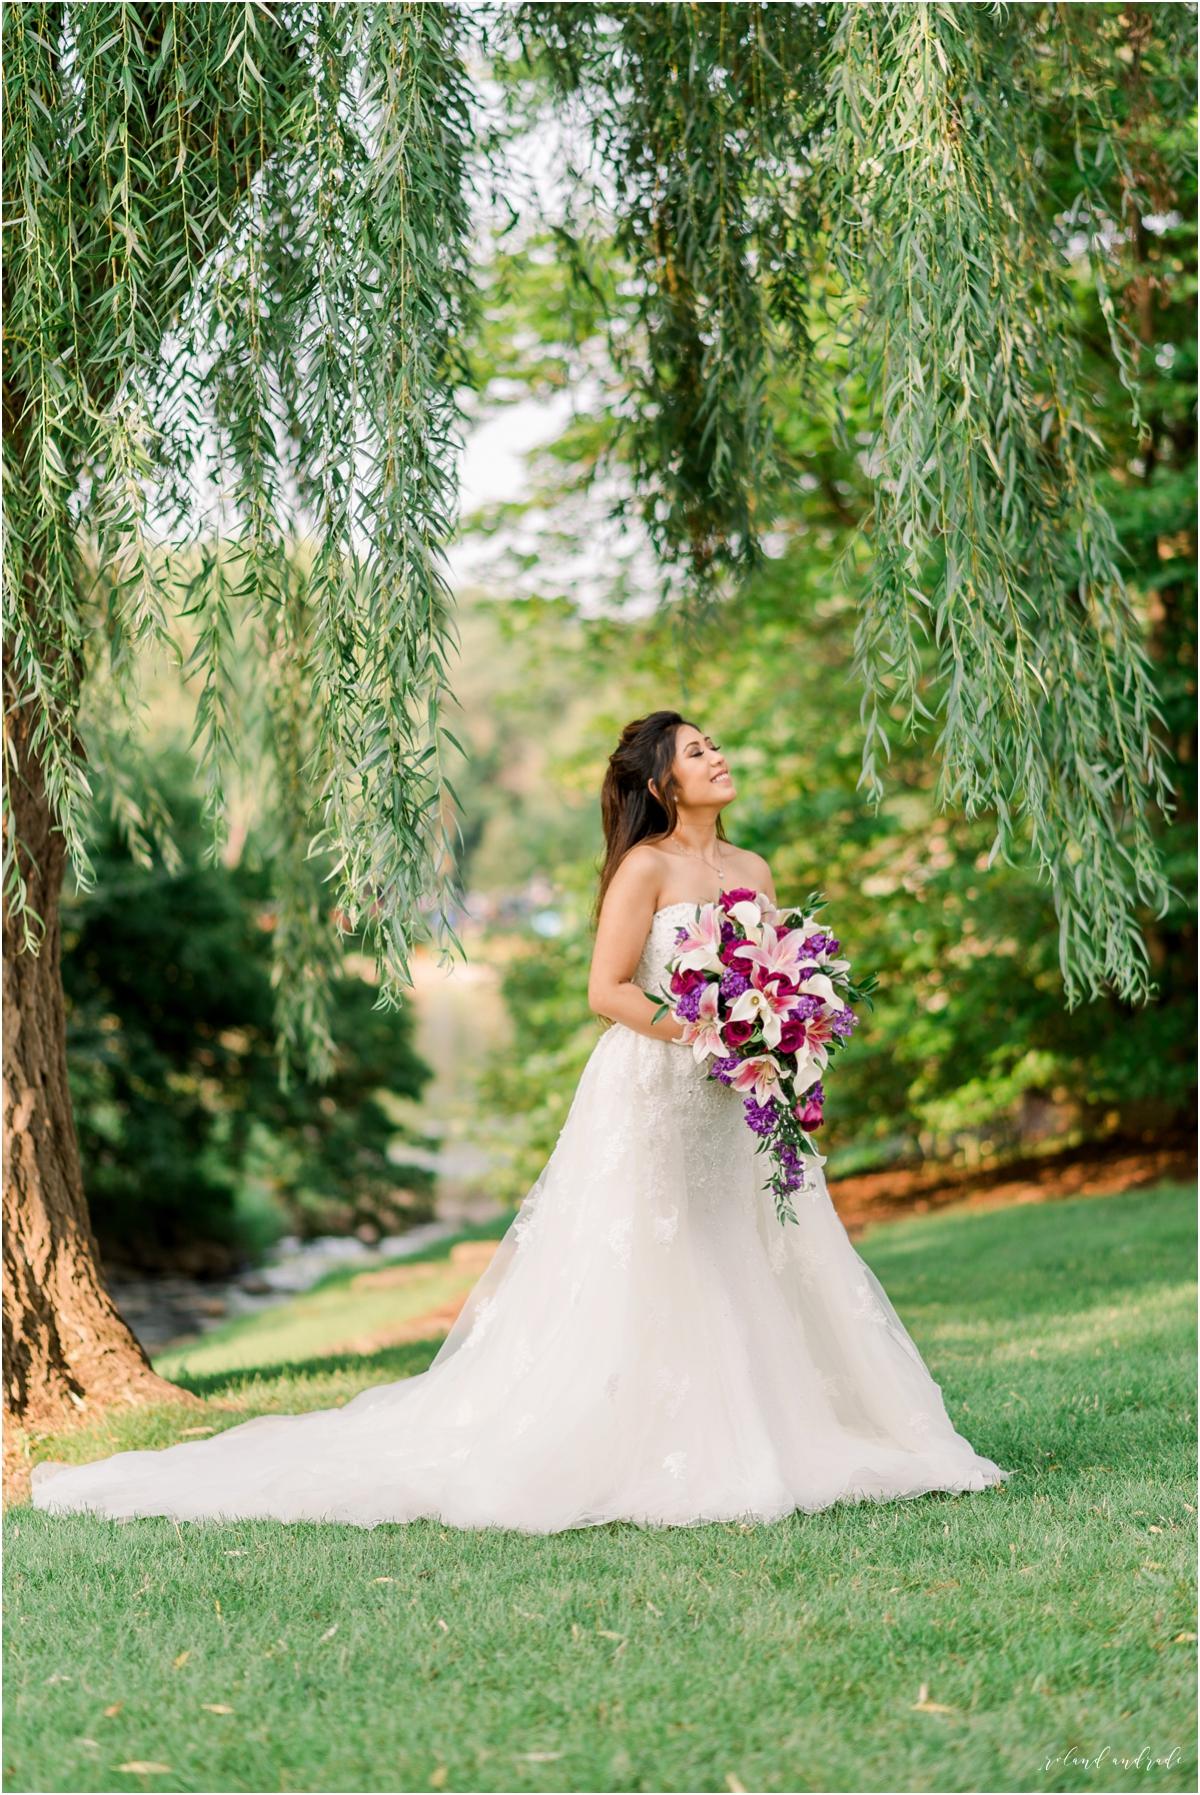 Meridian Banquets Wedding, Rolling Meadows Illinois Wedding, Chicago Wedding Photographer, Aurora Wedding Photographer, Best Photographer In Aurora, Best Photographer In Chicago_0078.jpg